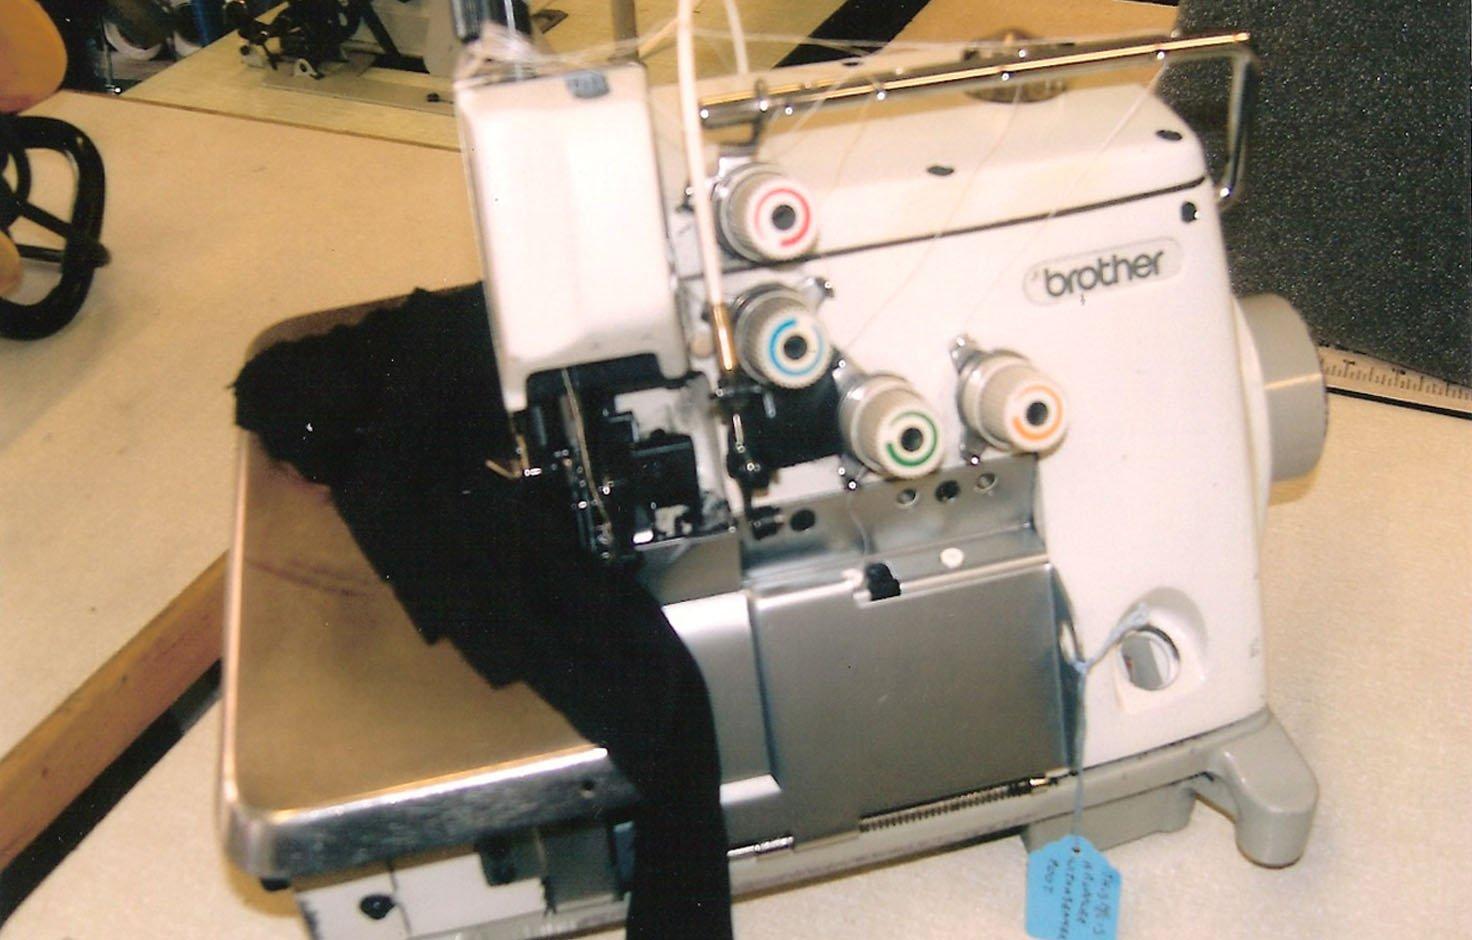 Overhauled fr re 4 fil machine coudre industrielle for Machine a coudre 4 fils